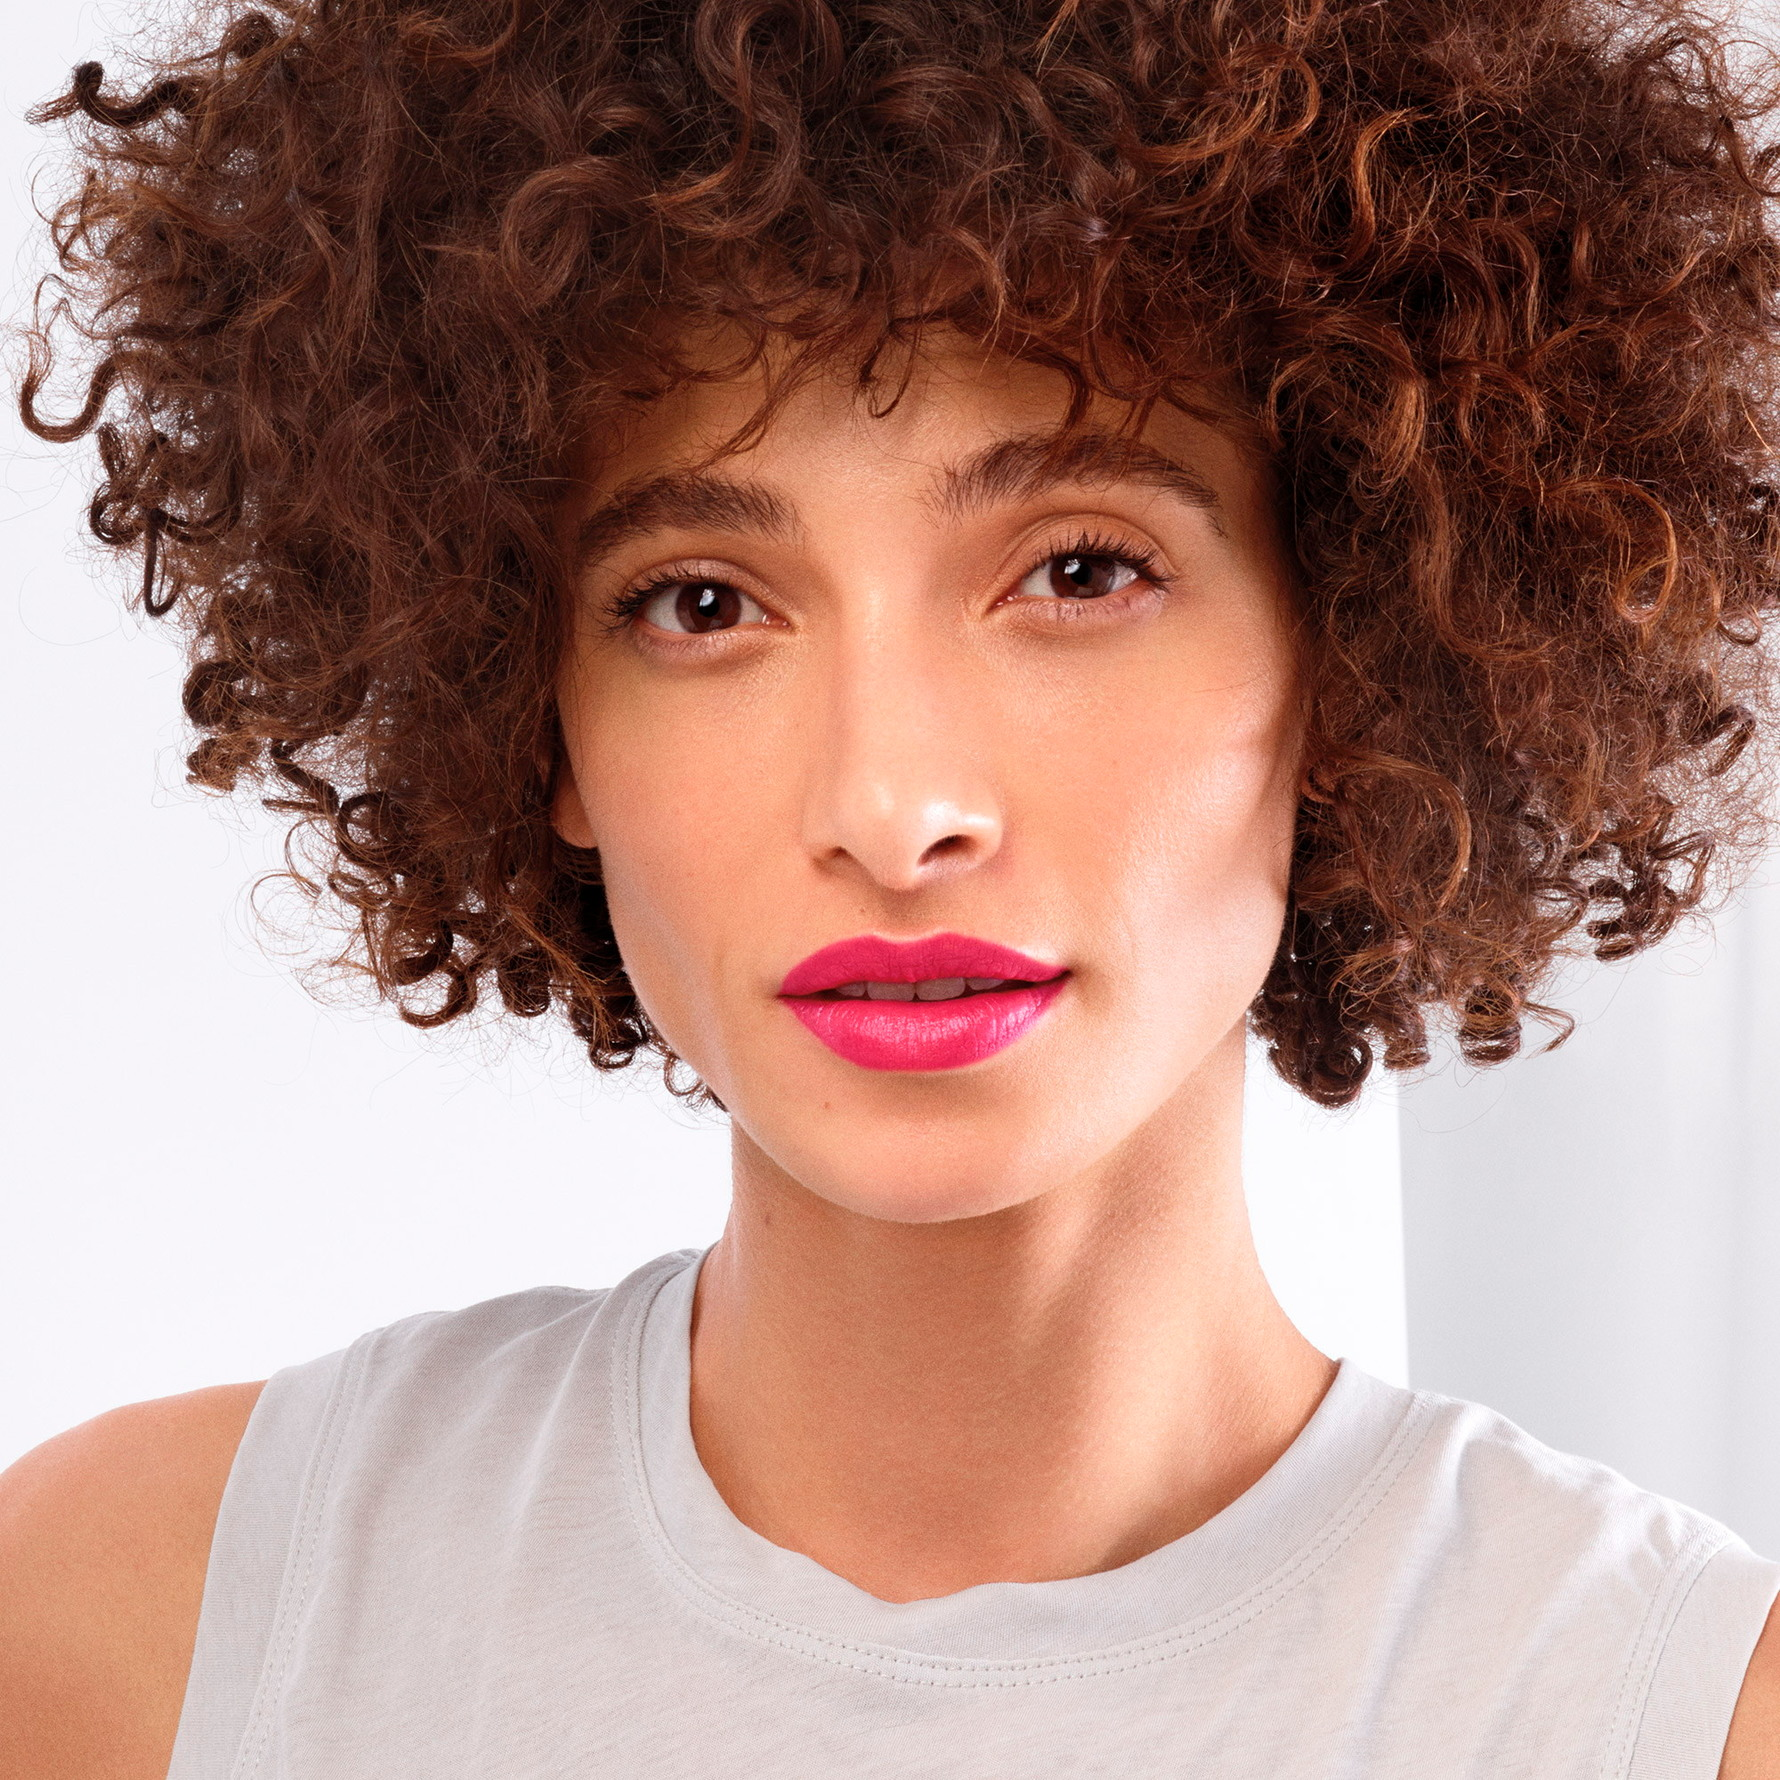 Køb Origins Blooming Bold Lipstick 12, 3,1 g - Matas